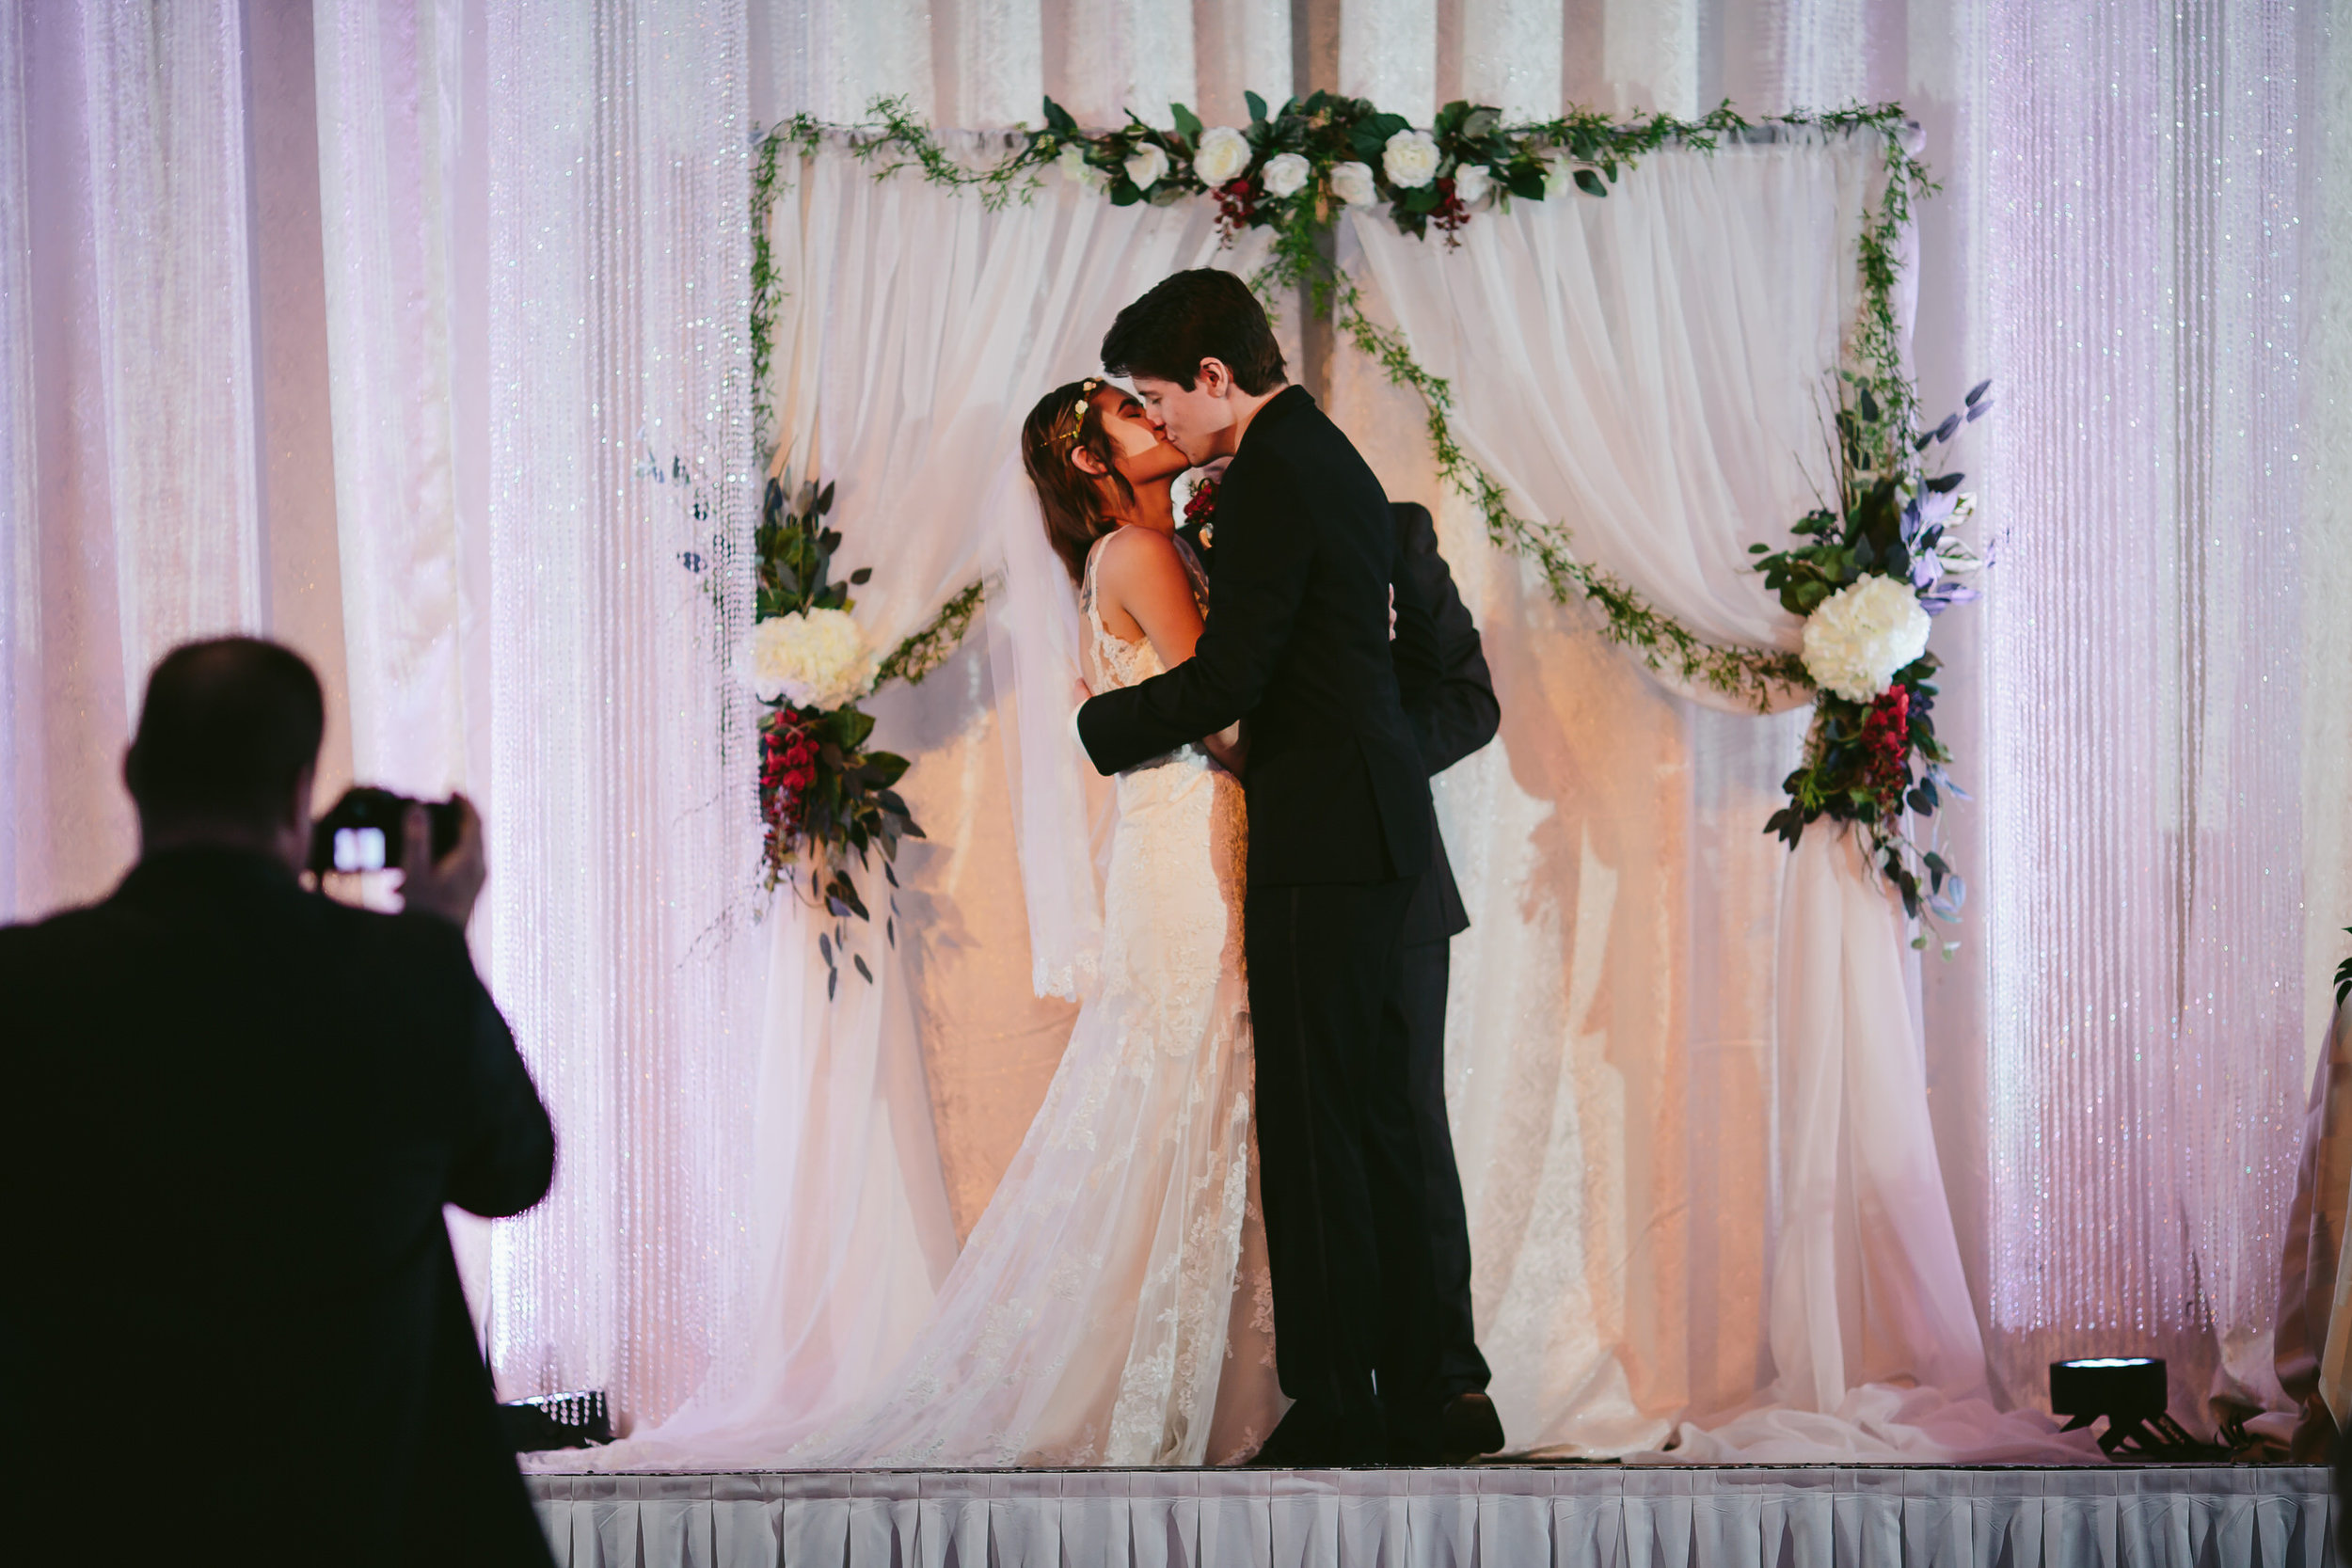 kiss_the_bride_tiny_house_photo_wedding_ceremony.jpg